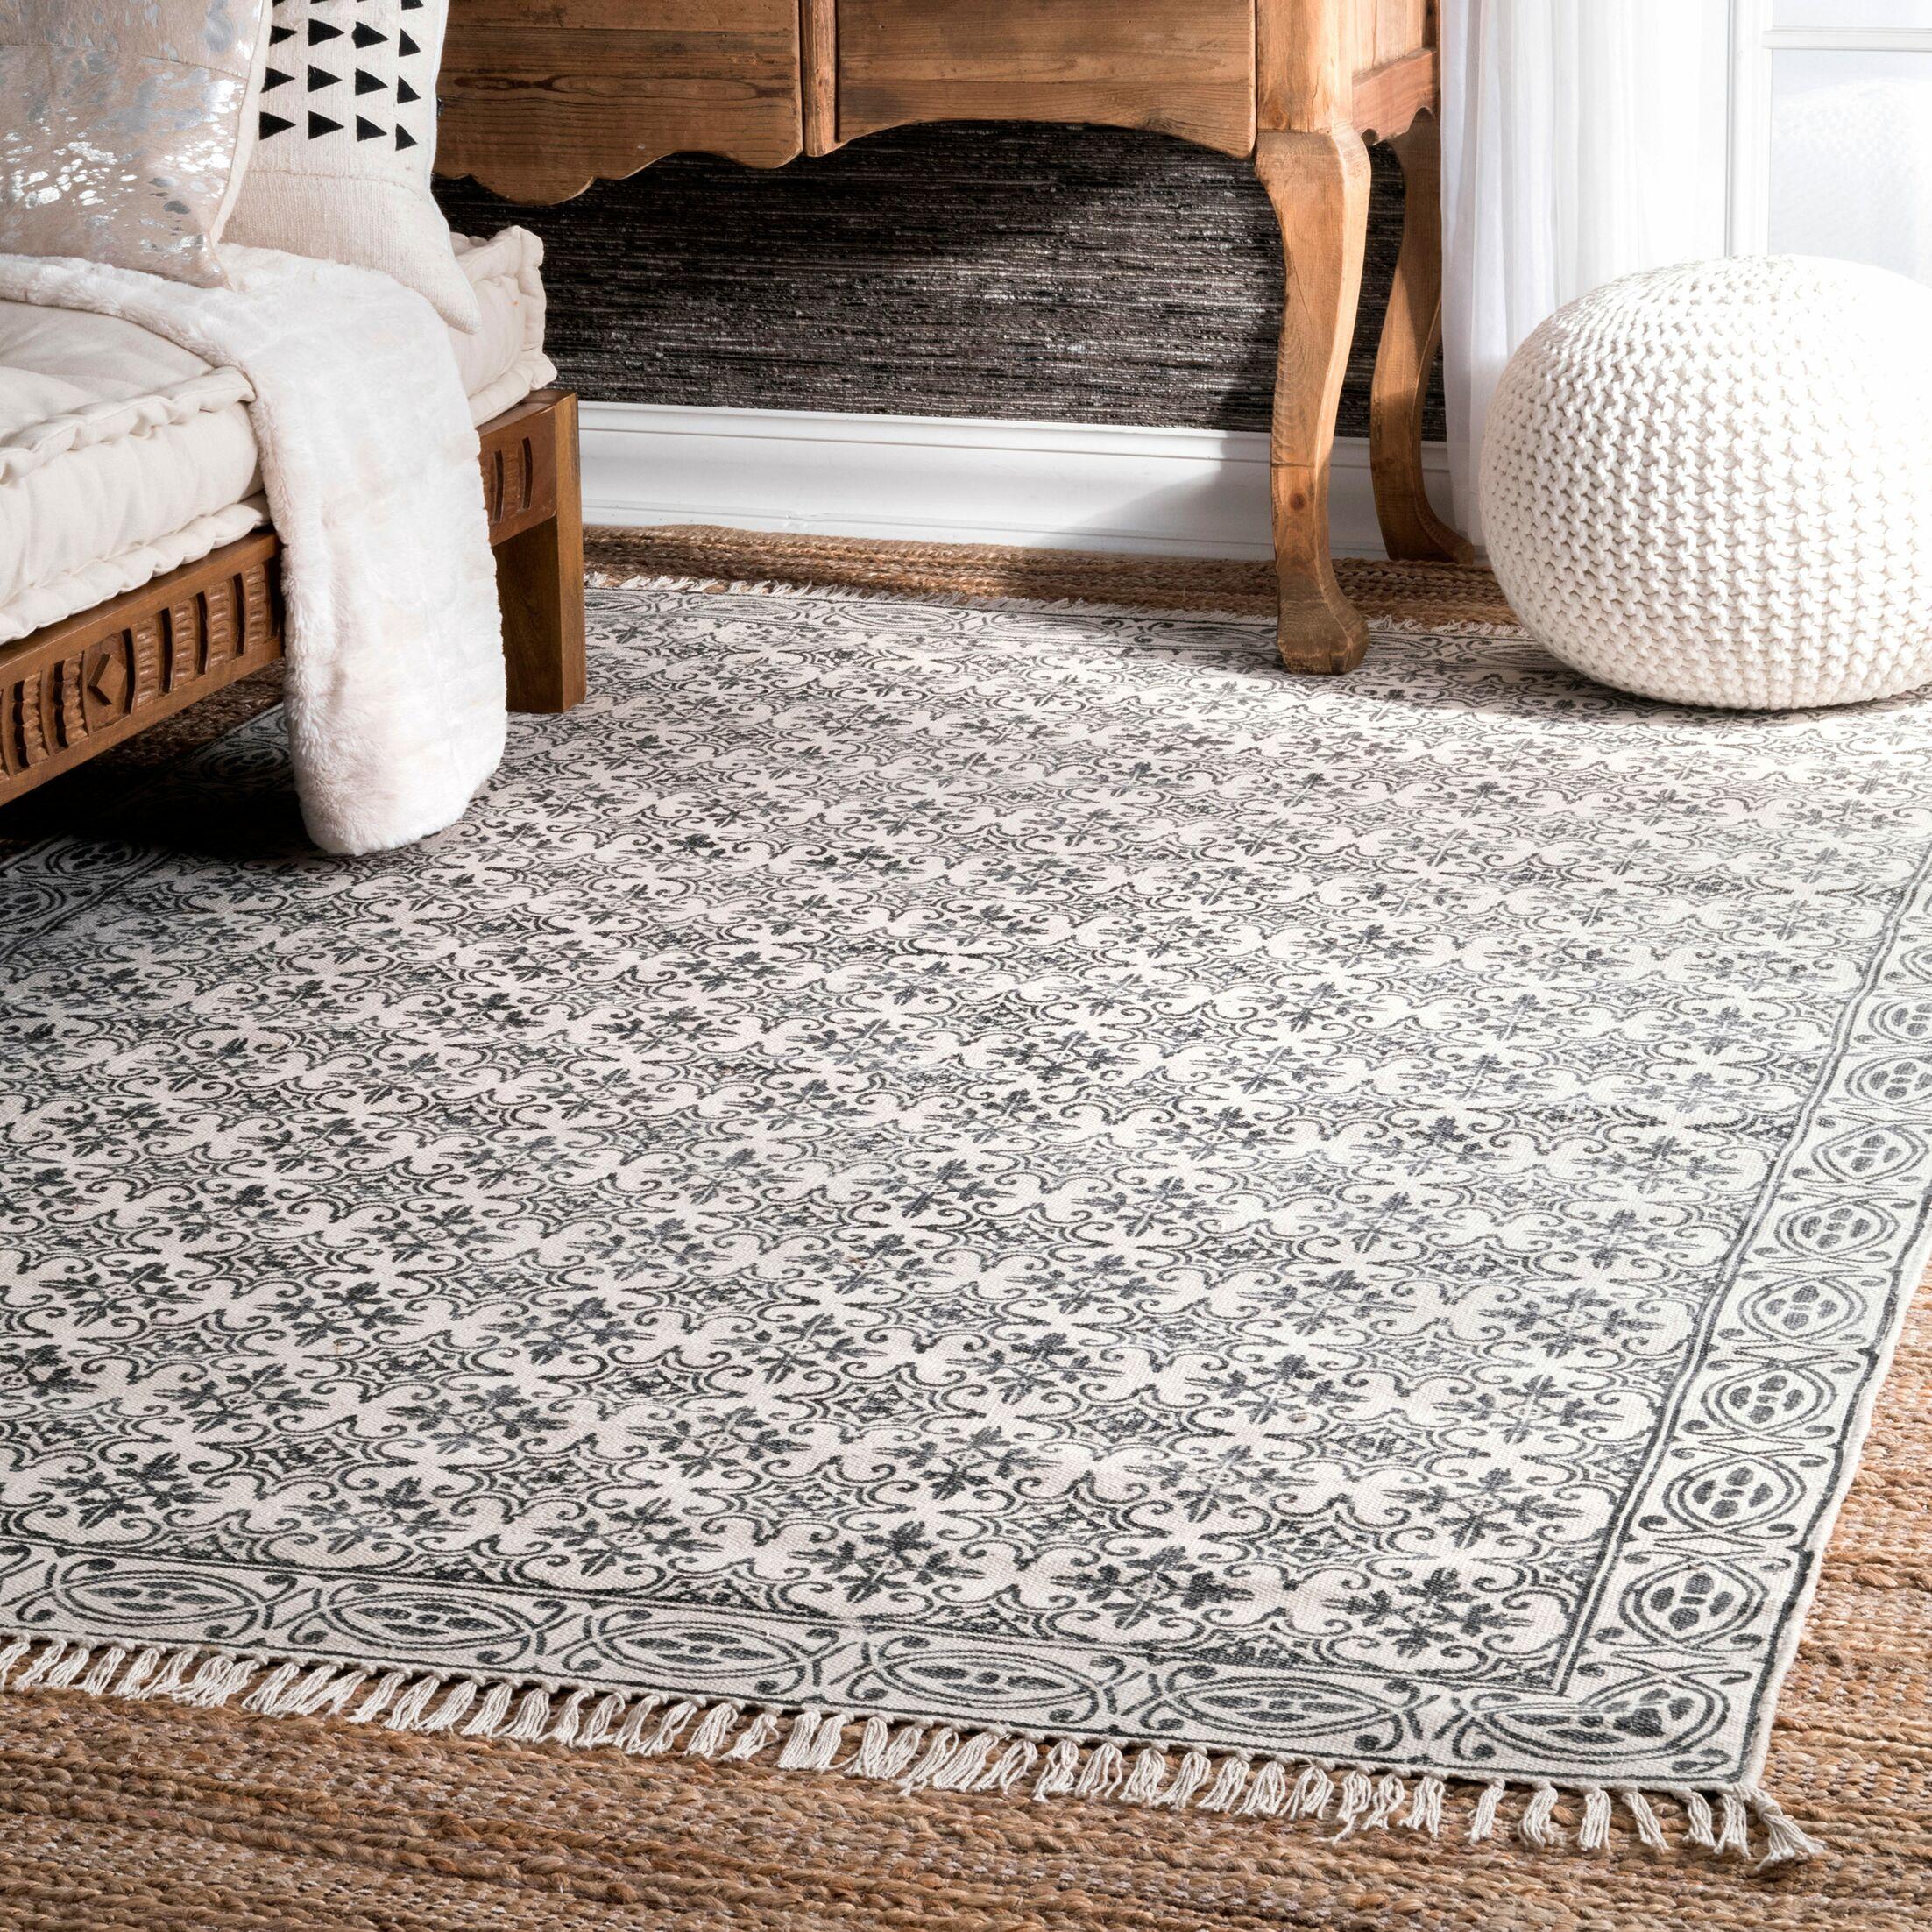 Raelyn Handmade Off White Area Rug Rug Size: 5' x 8'